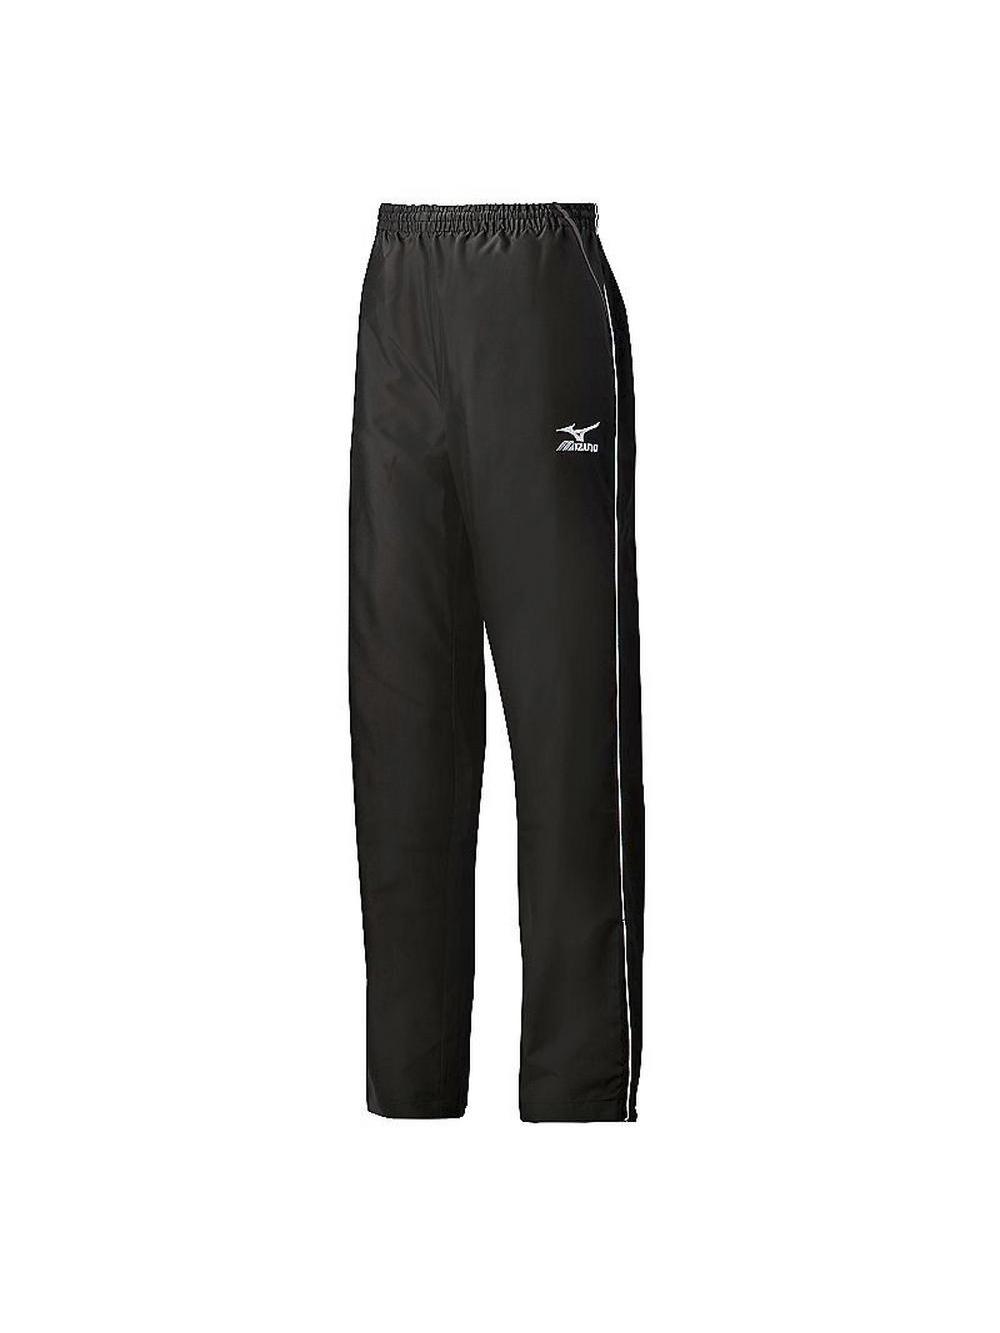 mizuno pants